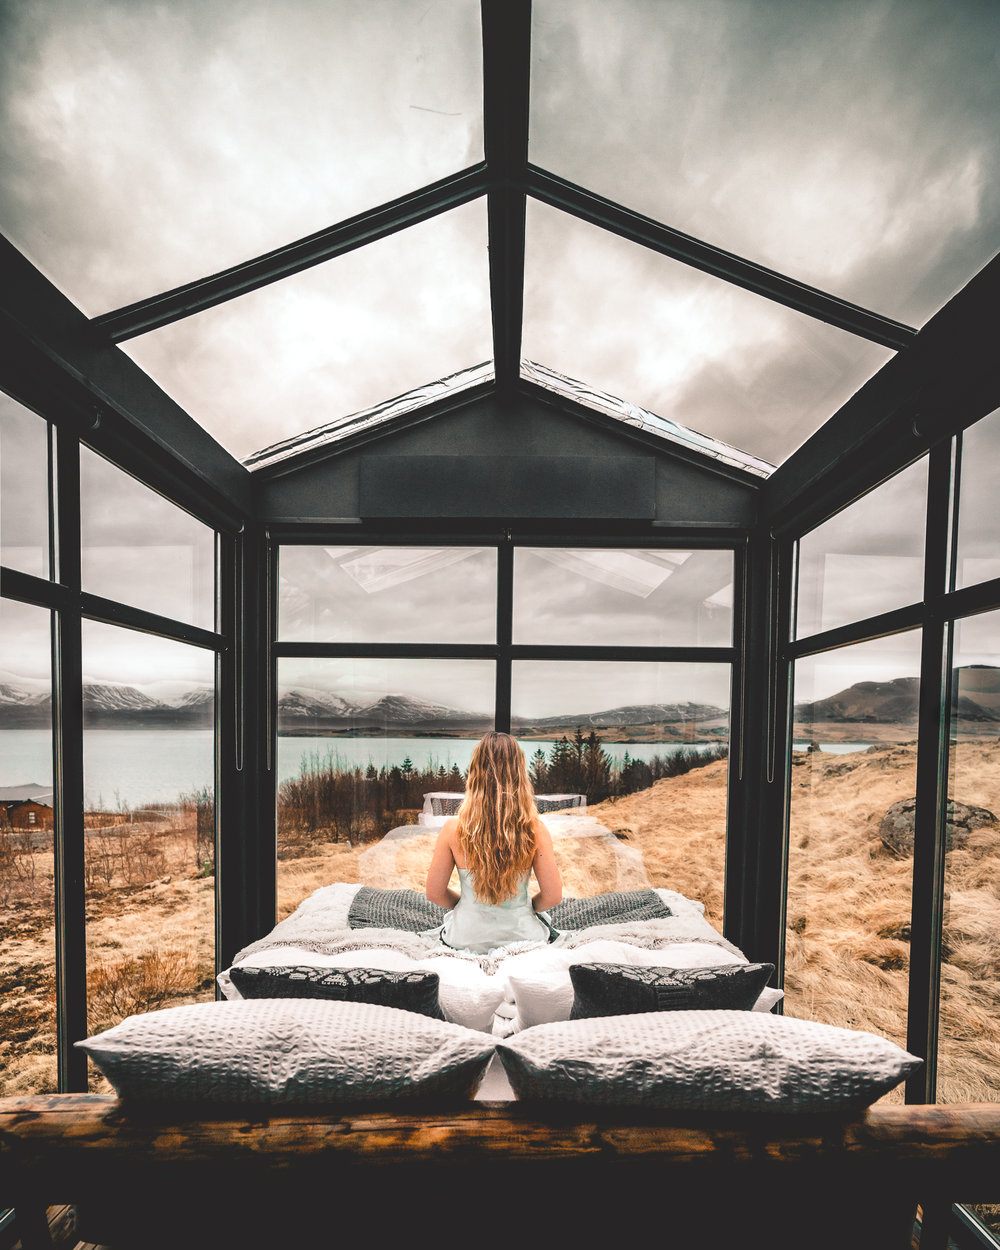 Iceland Panorama Inside-11.jpg